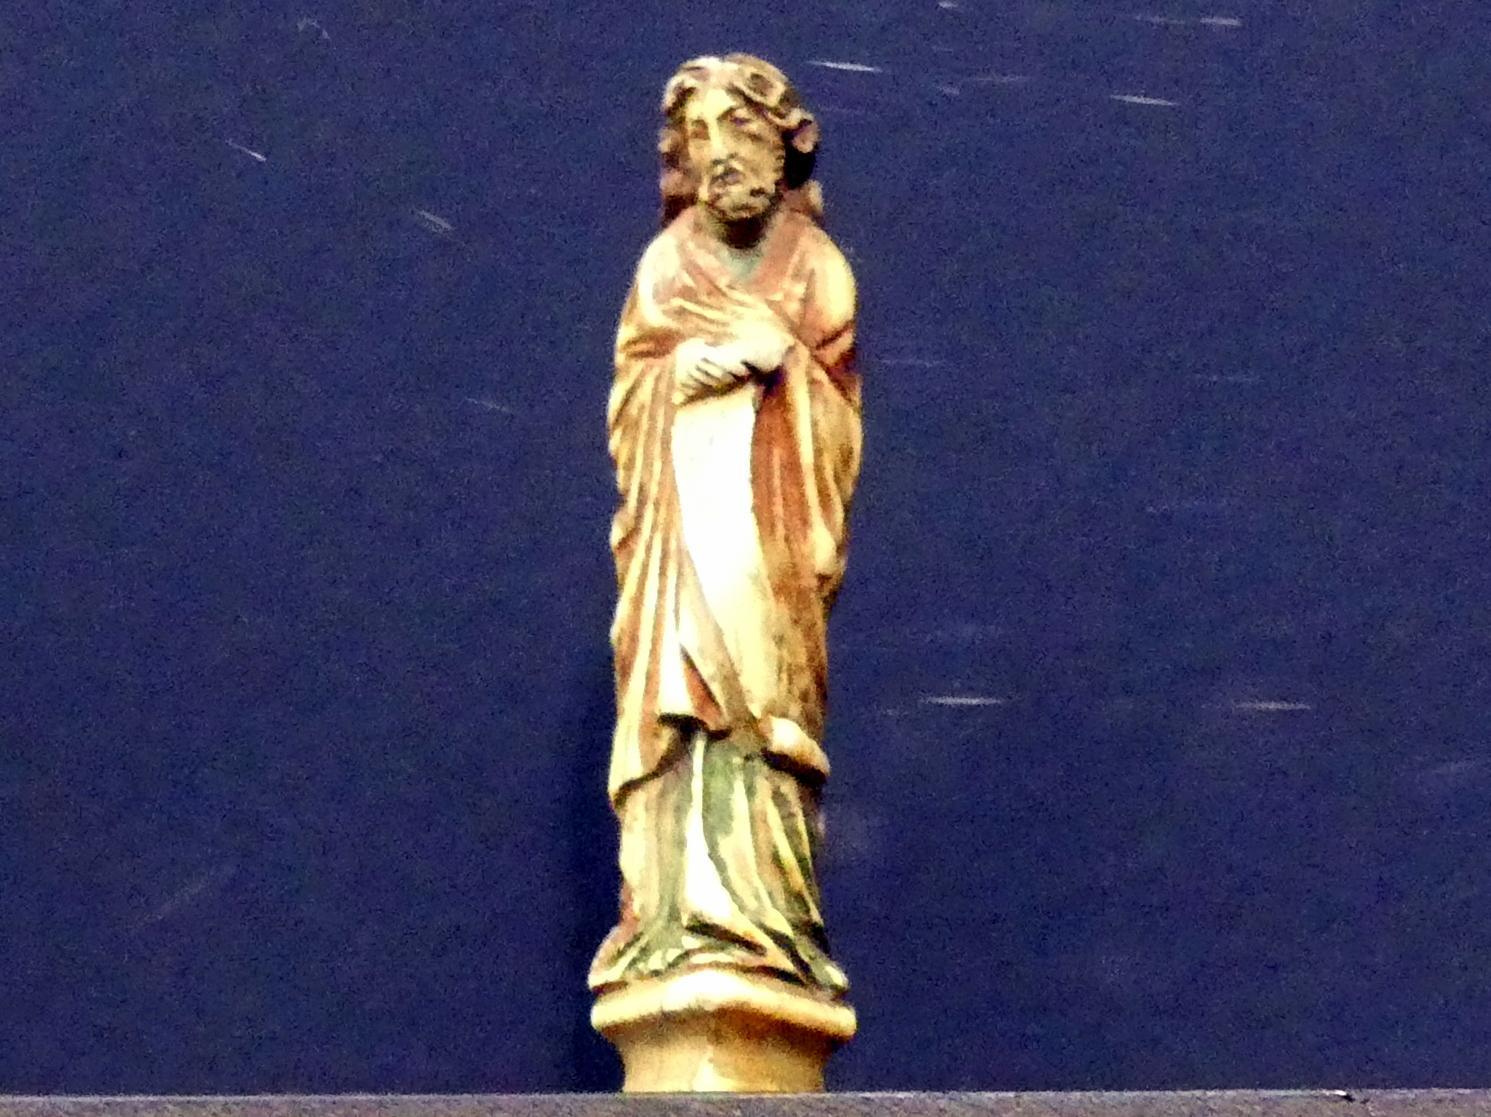 Prophet, Um 1300 - 1330